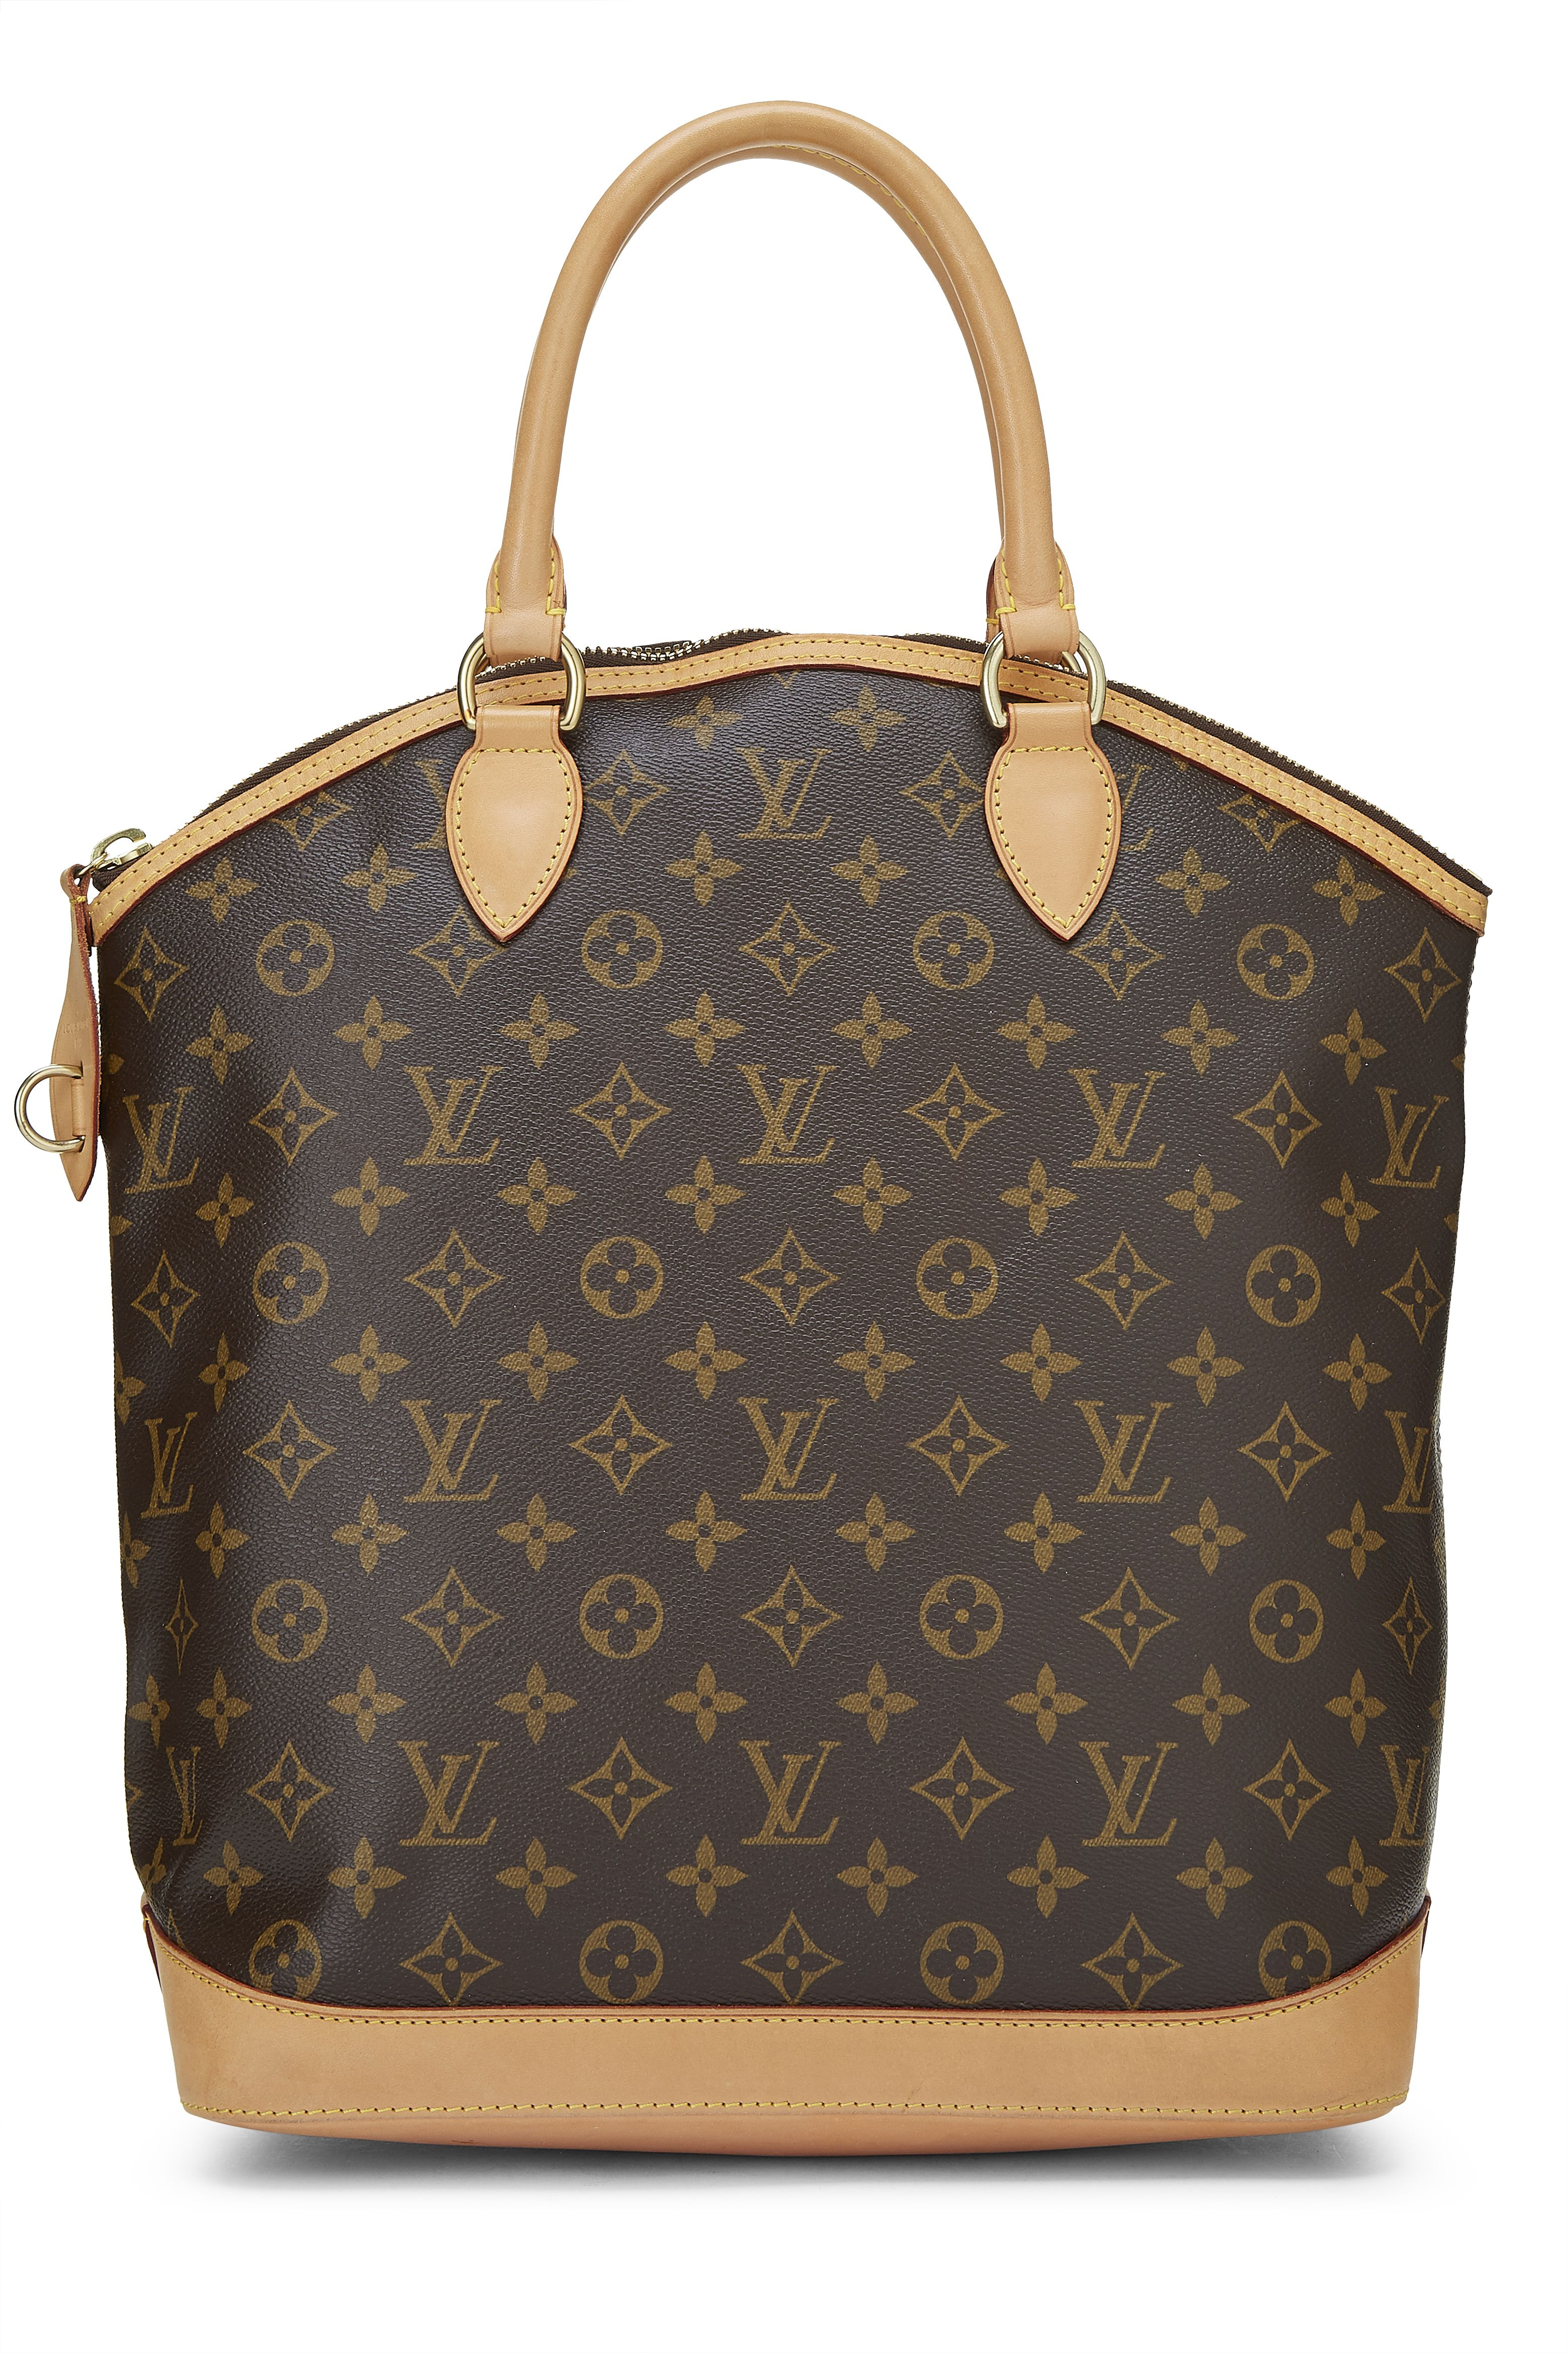 Louis Vuitton Monogram Canvas Lock It Vertical Han